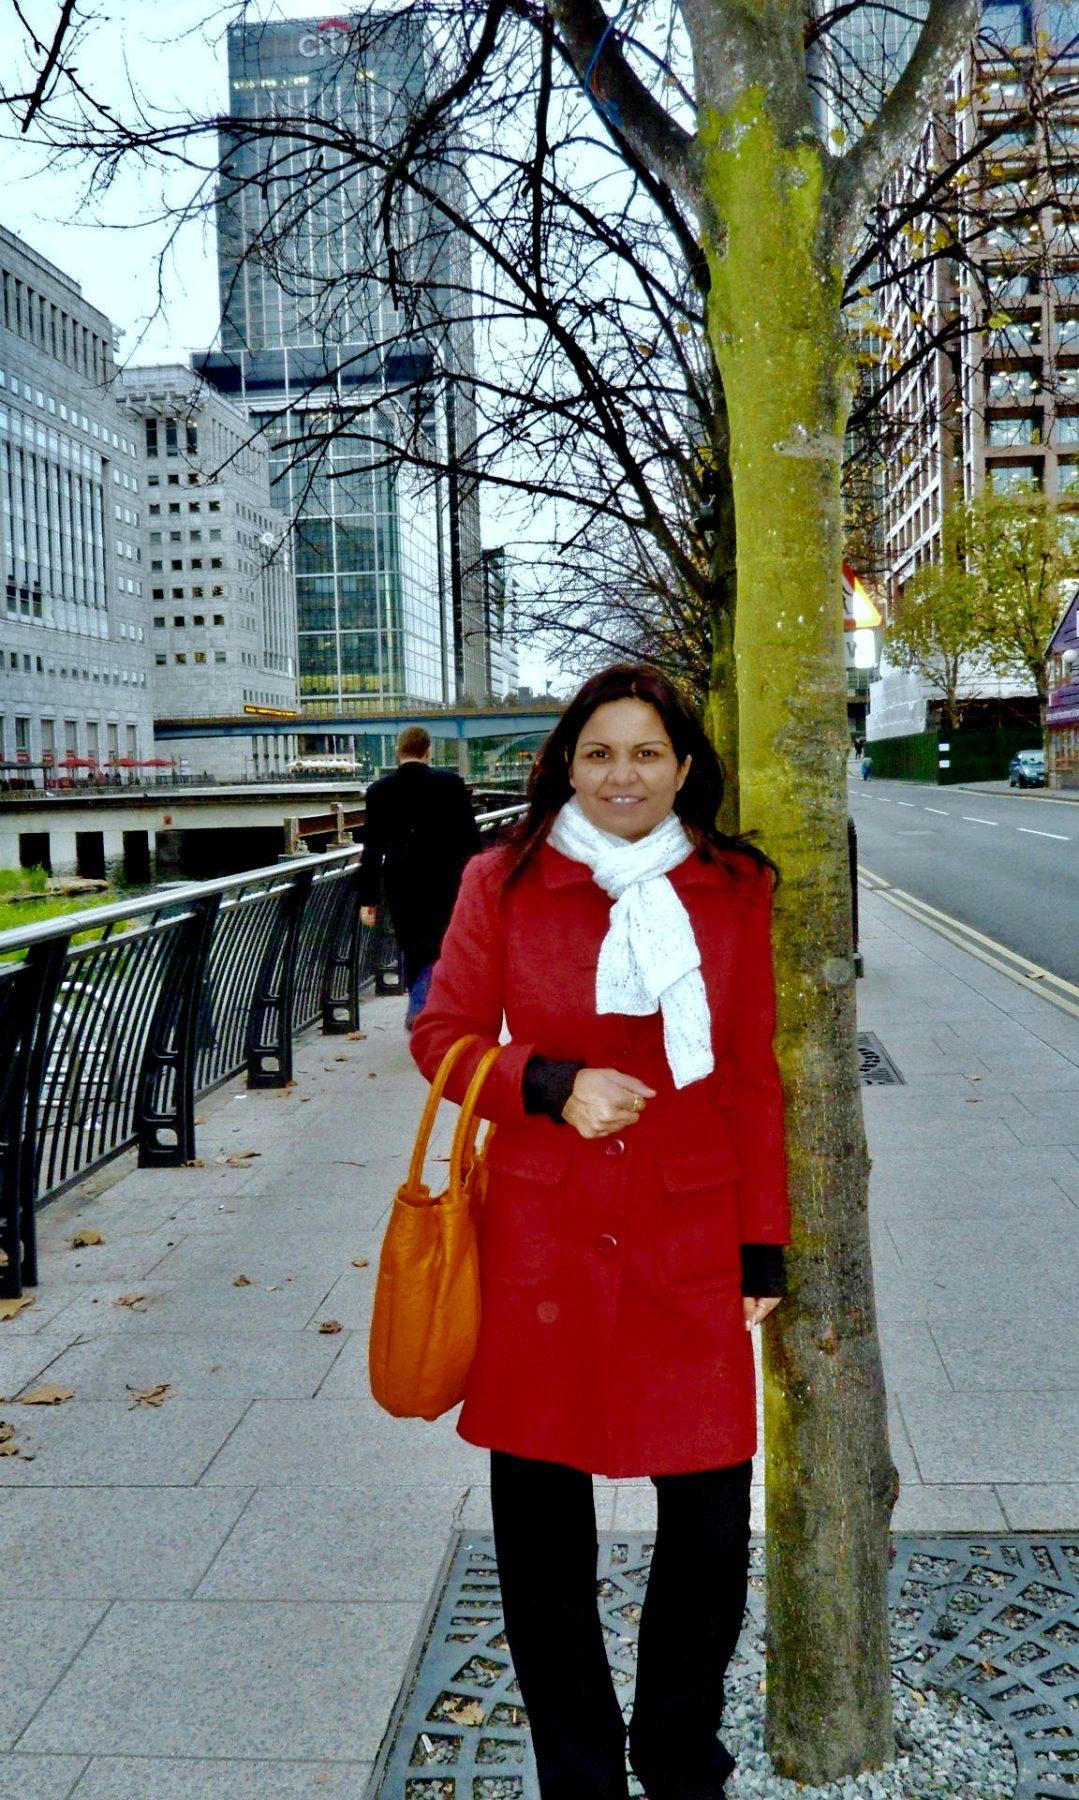 europe winter travel outfit ideas europe,winter,travel,outfit,ideas.styleguide,winter vacation, red coat, faux fur coat,